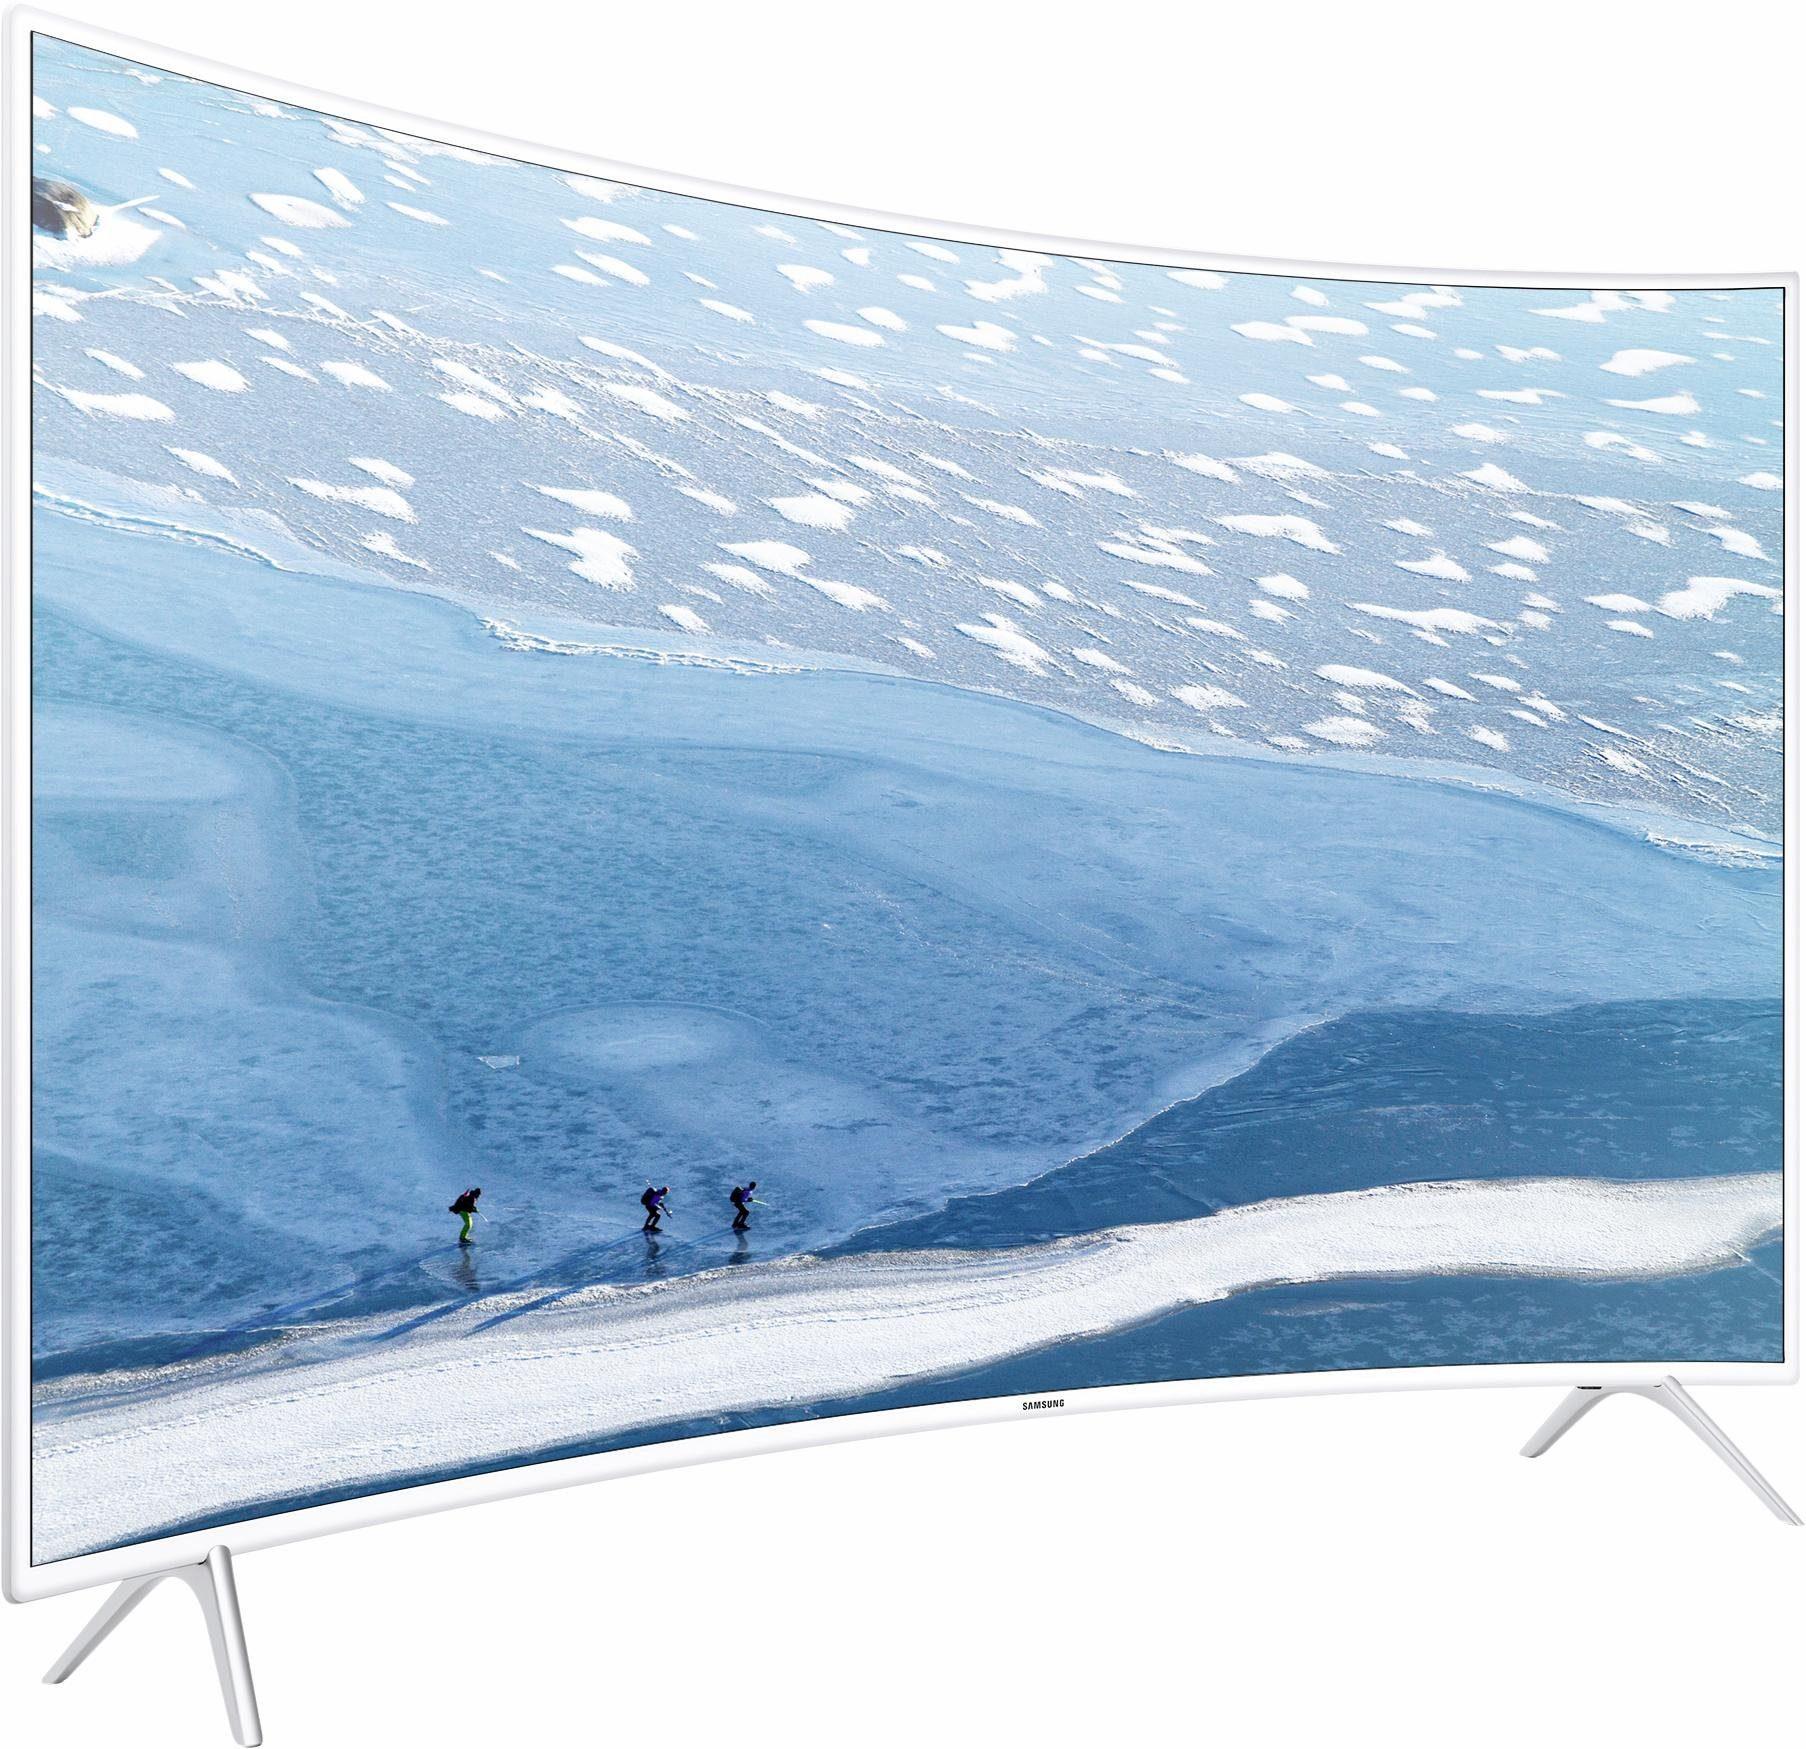 Samsung UE55KU6519UXZG, Curved-LED-Fernseher, 138 cm (55 Zoll), 2160p (4K Ultra HD), Smart-TV